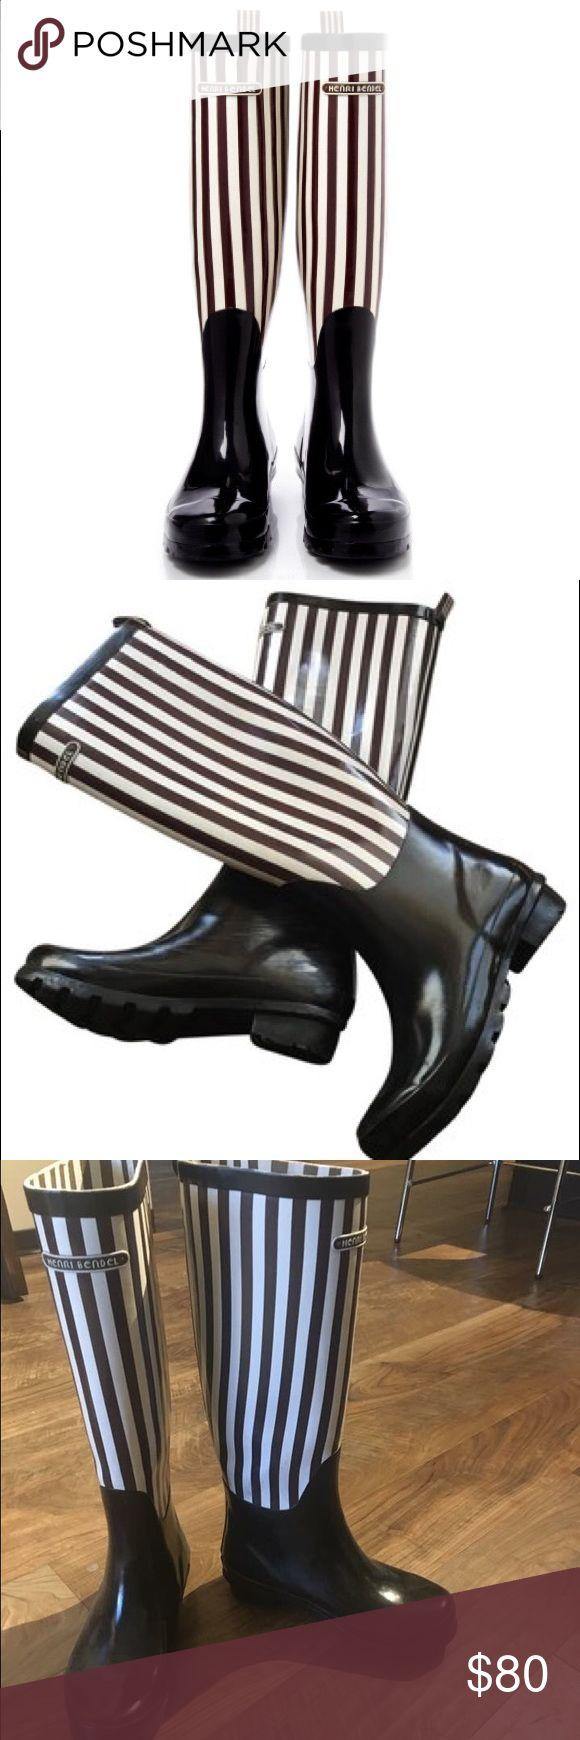 Iconic Henri Bendel Boots! NWOT! Never worn- black and white stripe Henri Bendel rain boots henri bendel Shoes Winter & Rain Boots